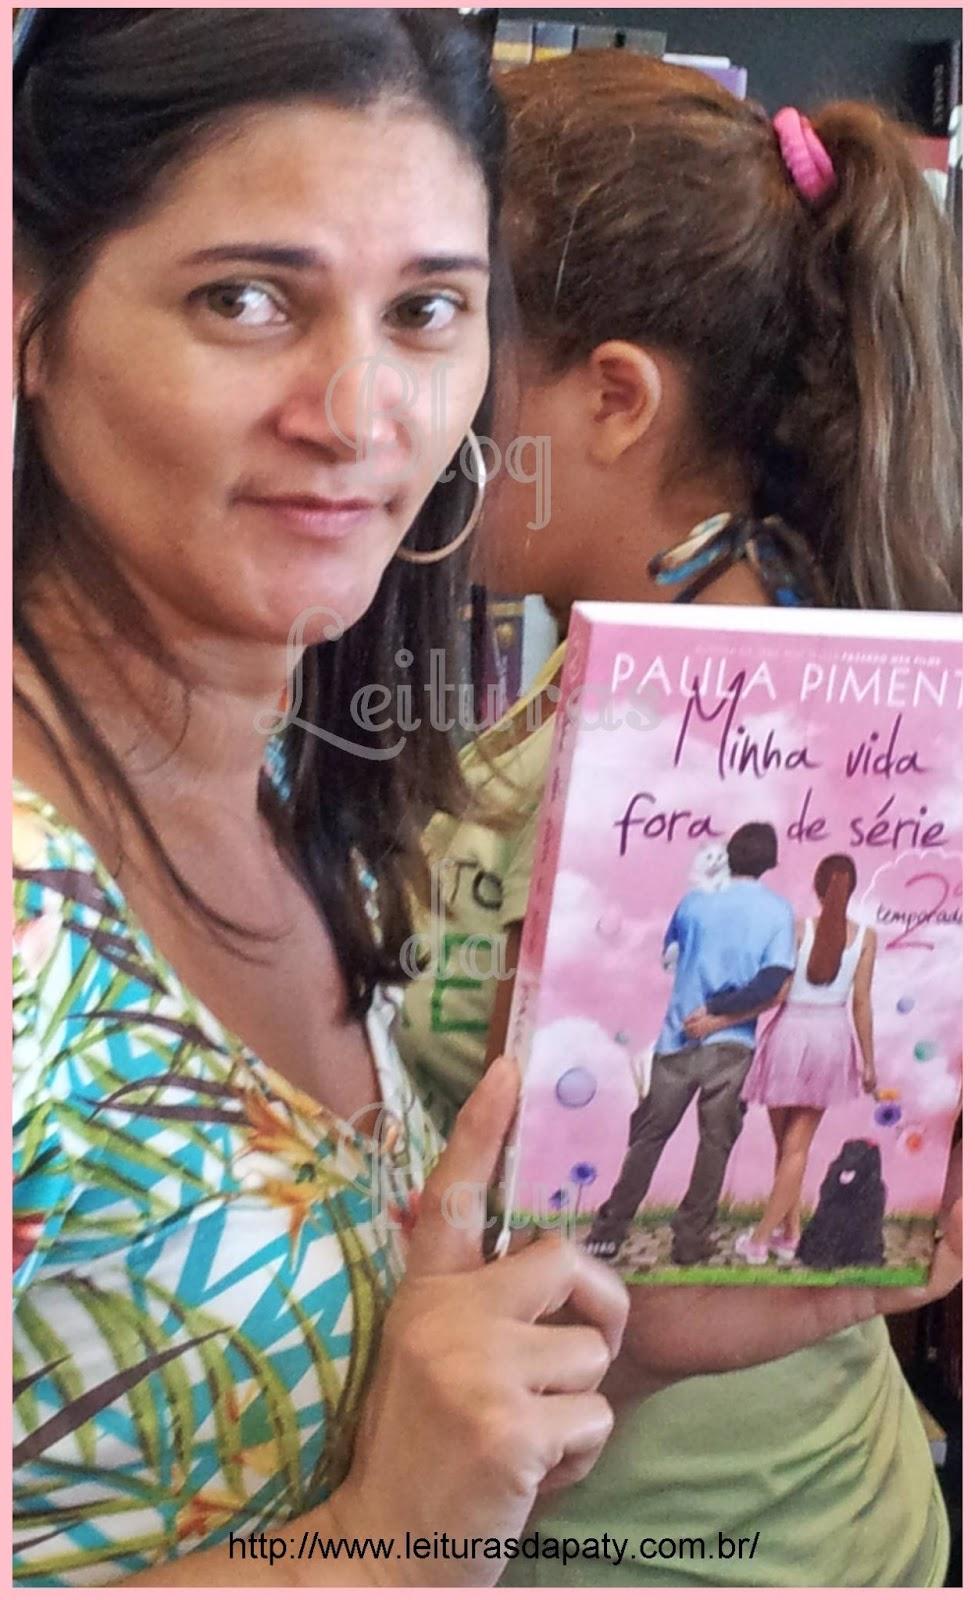 Flip 2013 - Paraty - Paula Pimenta - Blog Leituras da Paty